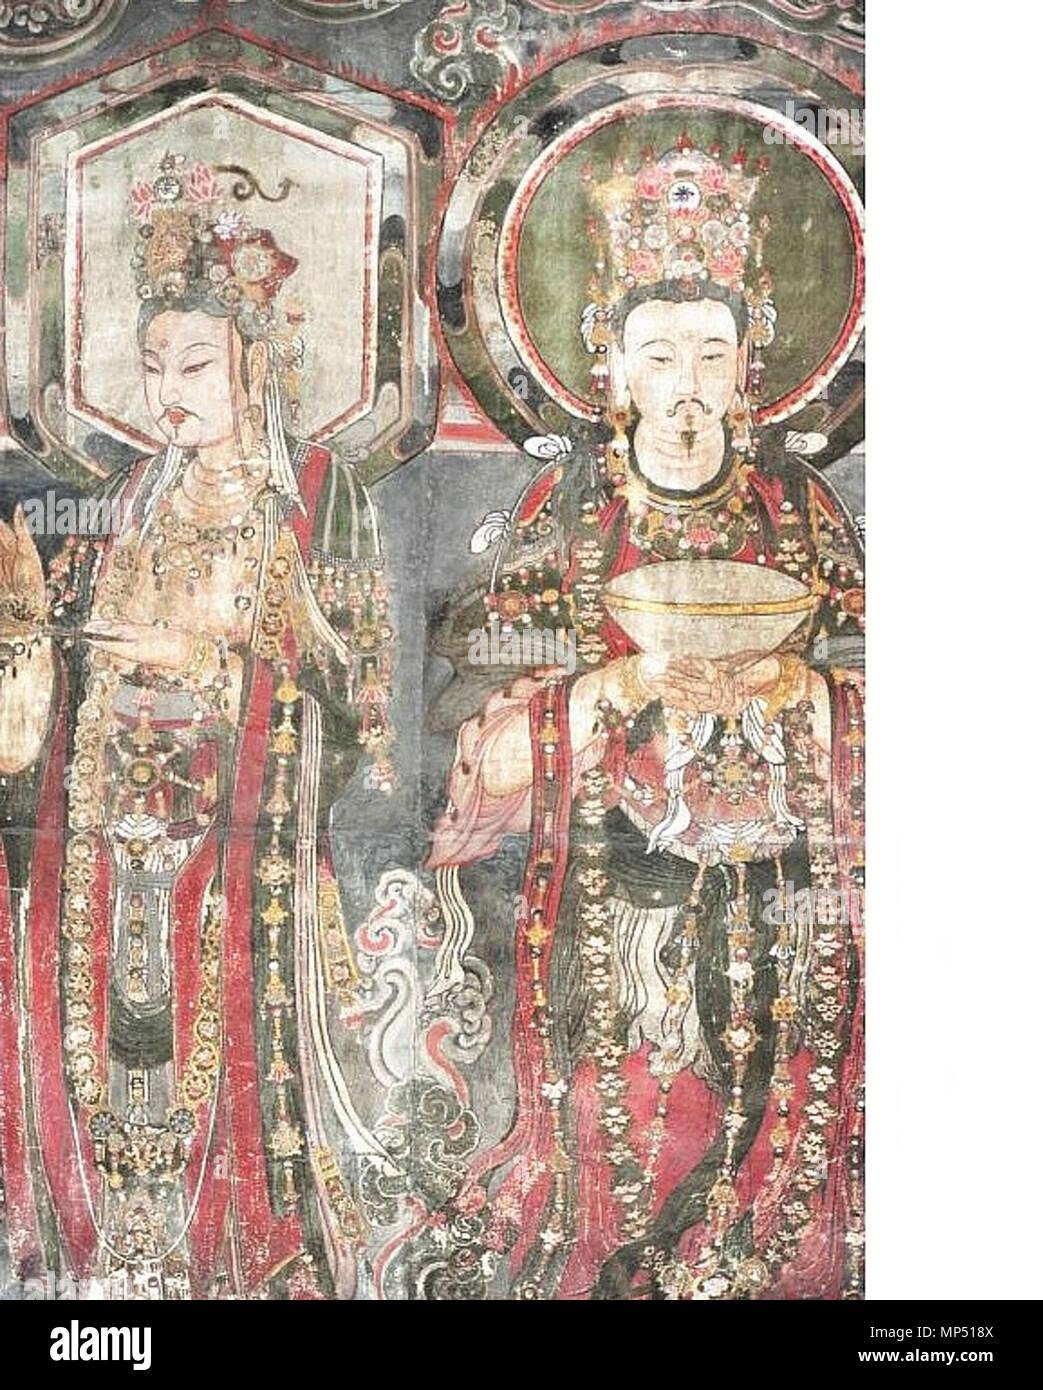 . English: Kin Dynasty (1115-1234) fresco in the Temple of Adoring Bliss (Ch'ung-fu Temple), Shuo-chou, Shansi. Español: Fresco en el Templo de la Adoración de la Prosperidad (Templo Ch'ung-fu), dinastía Kin (1115-1234), Shuo-chóu, Shansí. 5 October 2013, 05:11:29. Unknown artist of Kin Dynasty (1115-1234) 765 Kin Dynasty (1115-1234) fresco in Ch'ung-fu Temple, Shuo-chou 13 - Stock Image